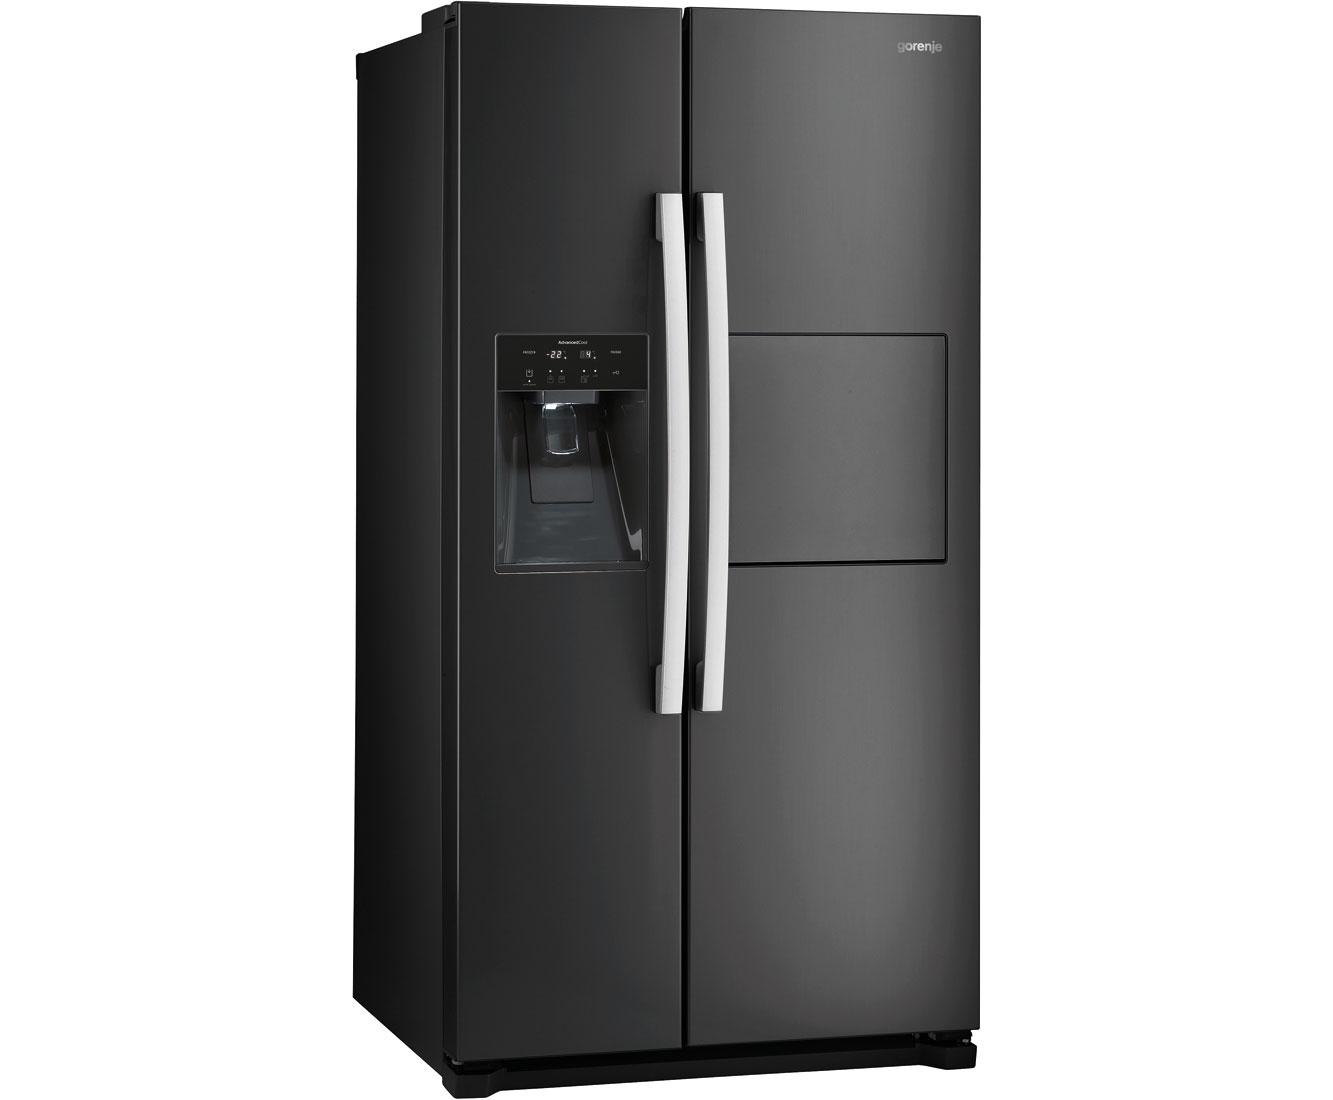 Gorenje Kühlschrank Preisvergleich : Side by side kühlschrank kaufen gorenje nrs9182bx preisvergleich